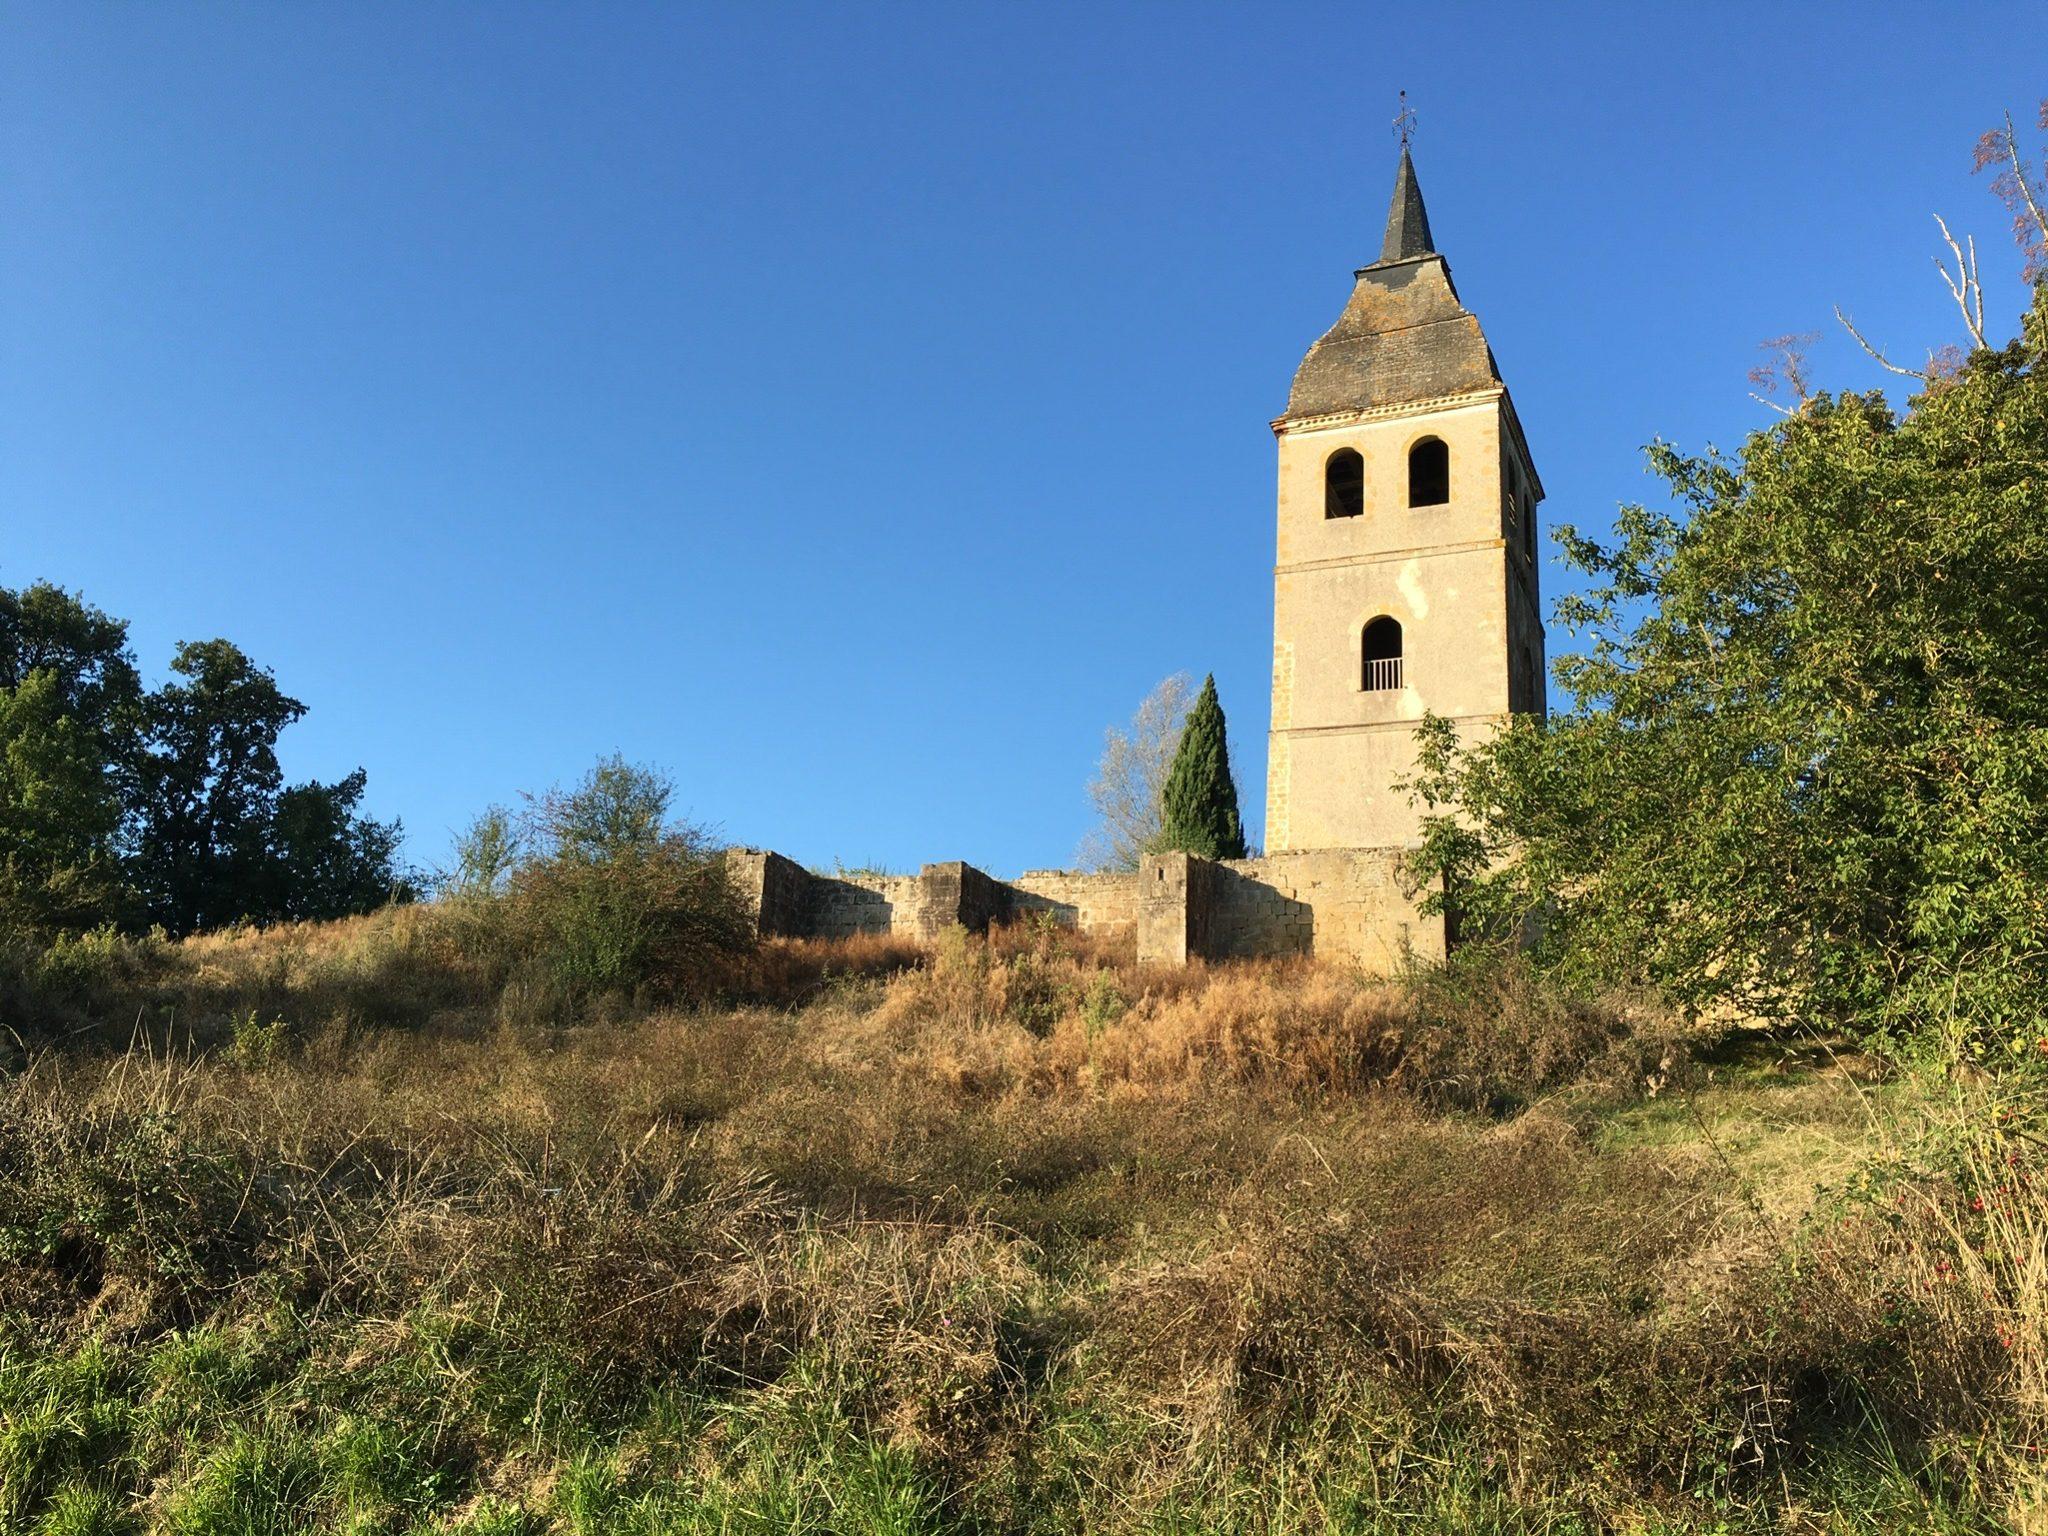 Sight Seeing | Domaine du Pignoulet, Gascony, France